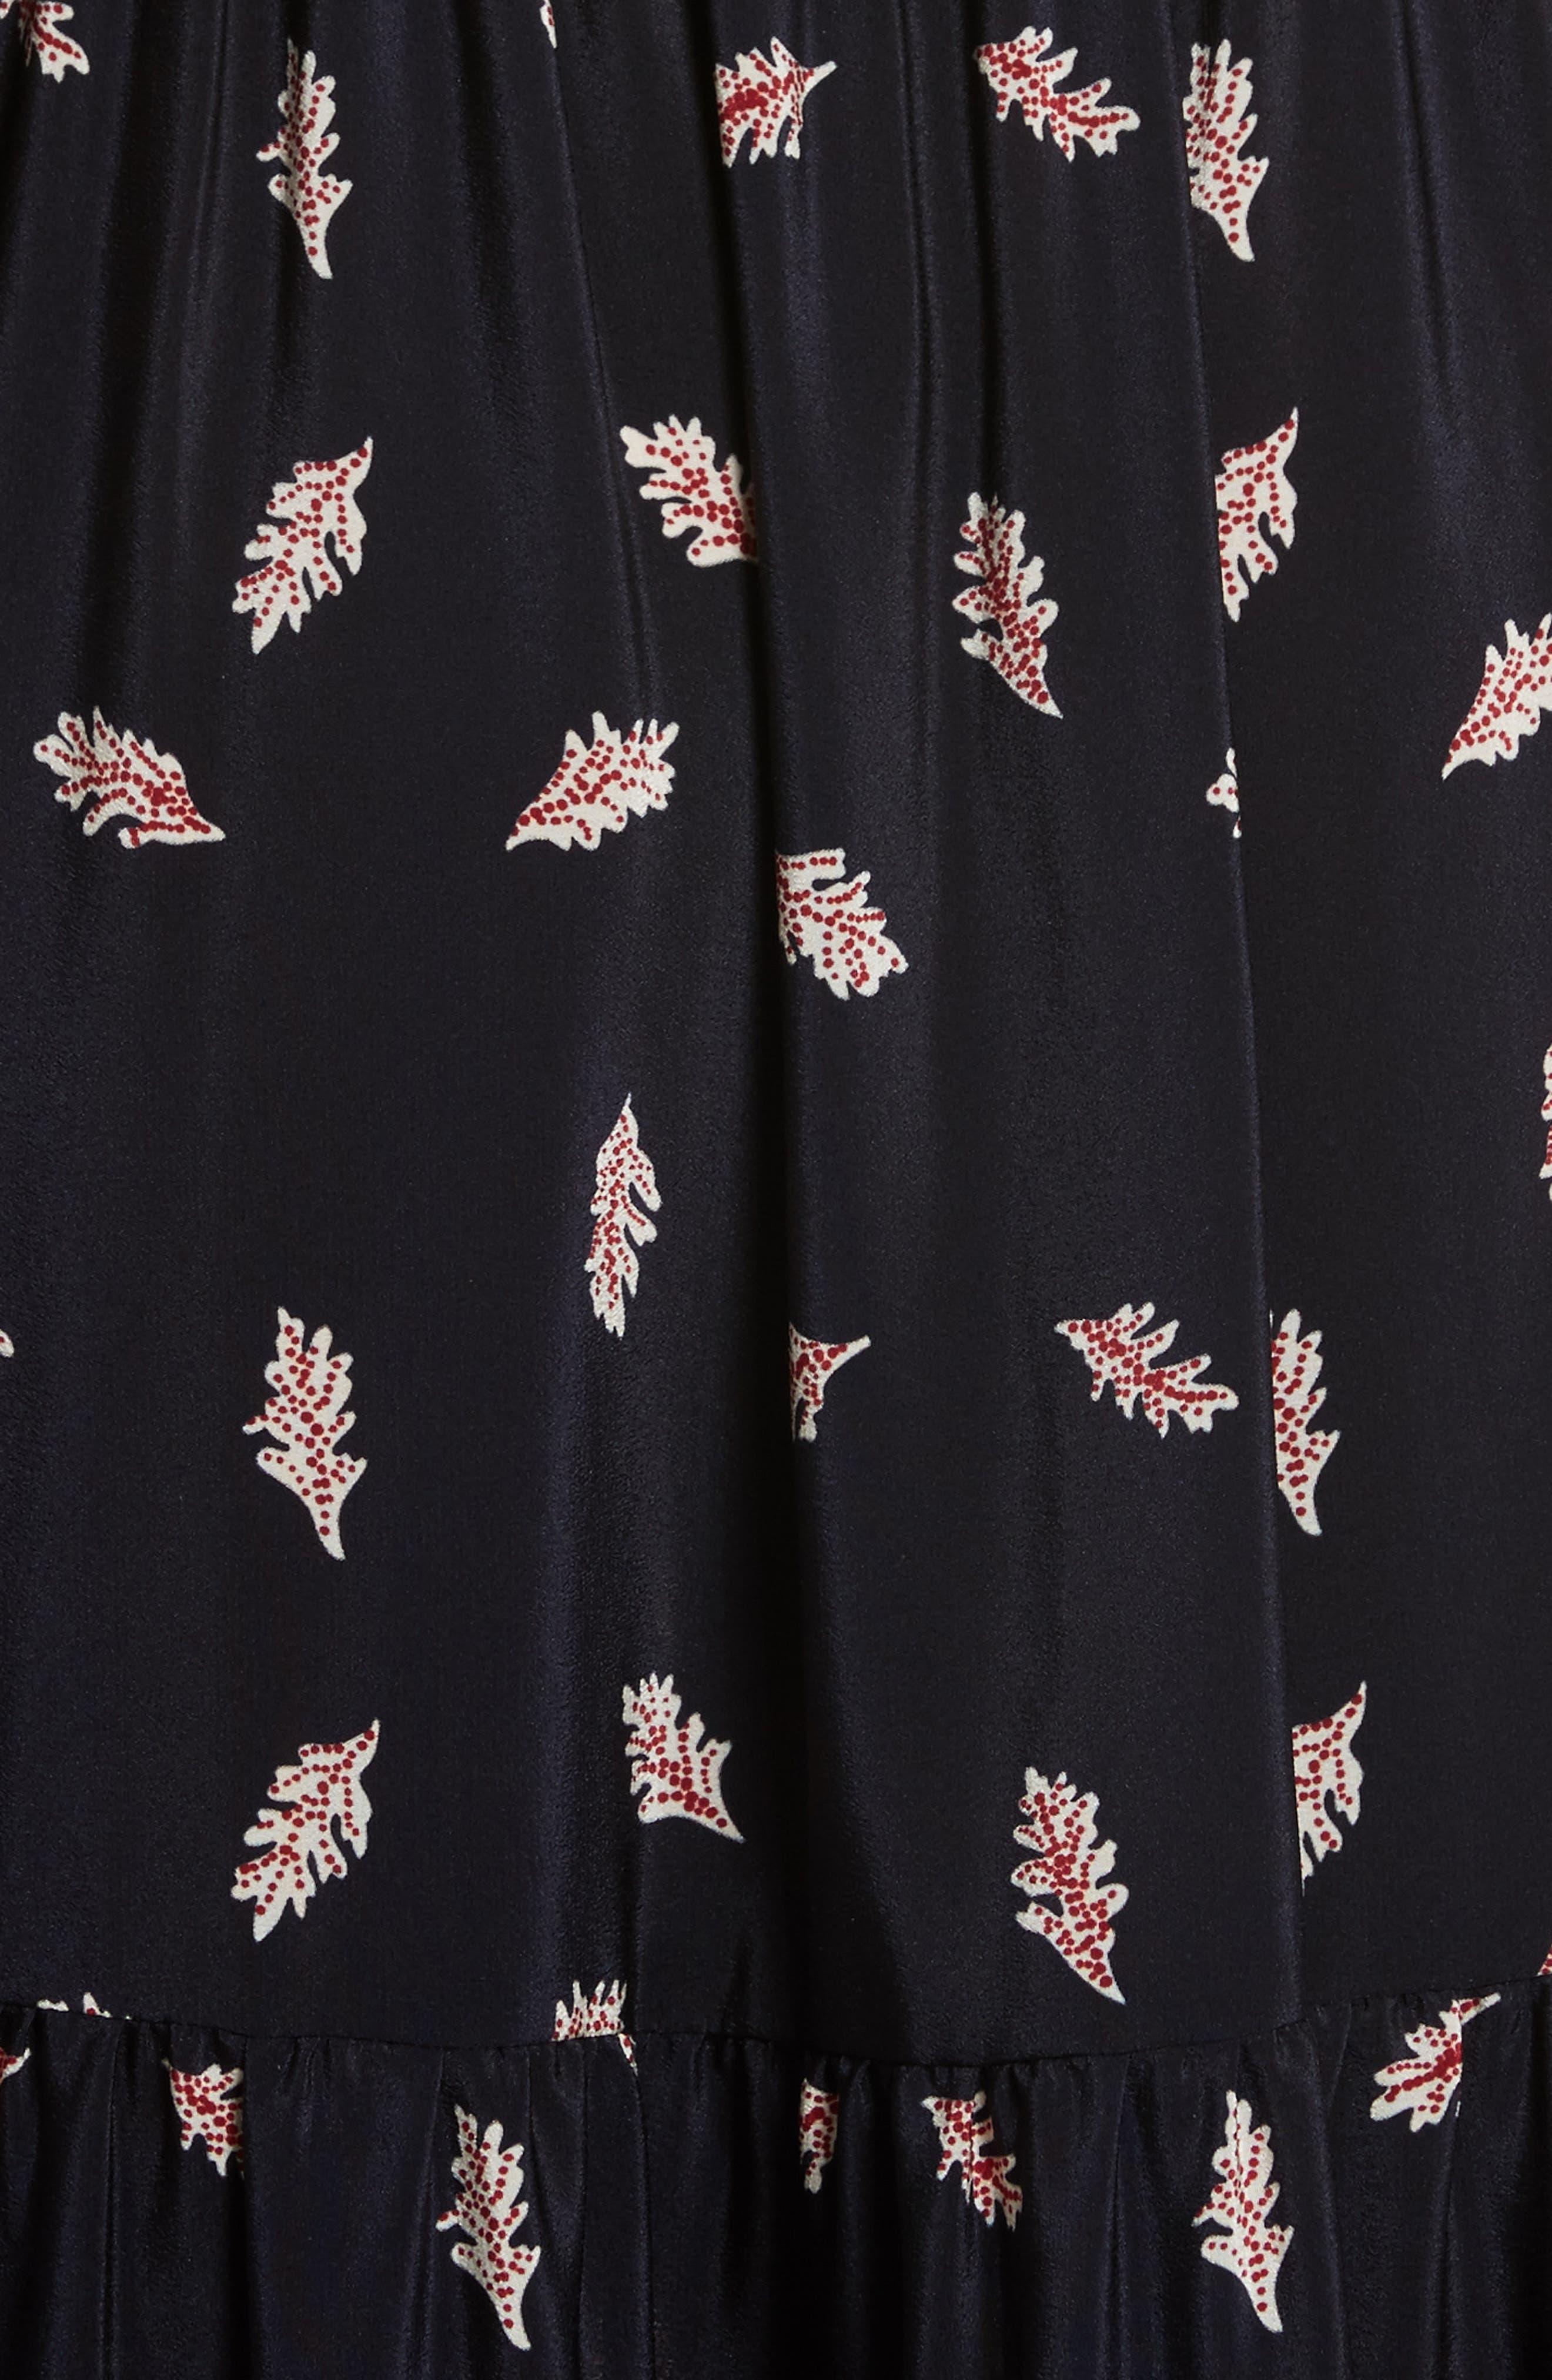 Eloise Print Silk Maxi Dress,                             Alternate thumbnail 5, color,                             Navy/ Red/ Cream Multi